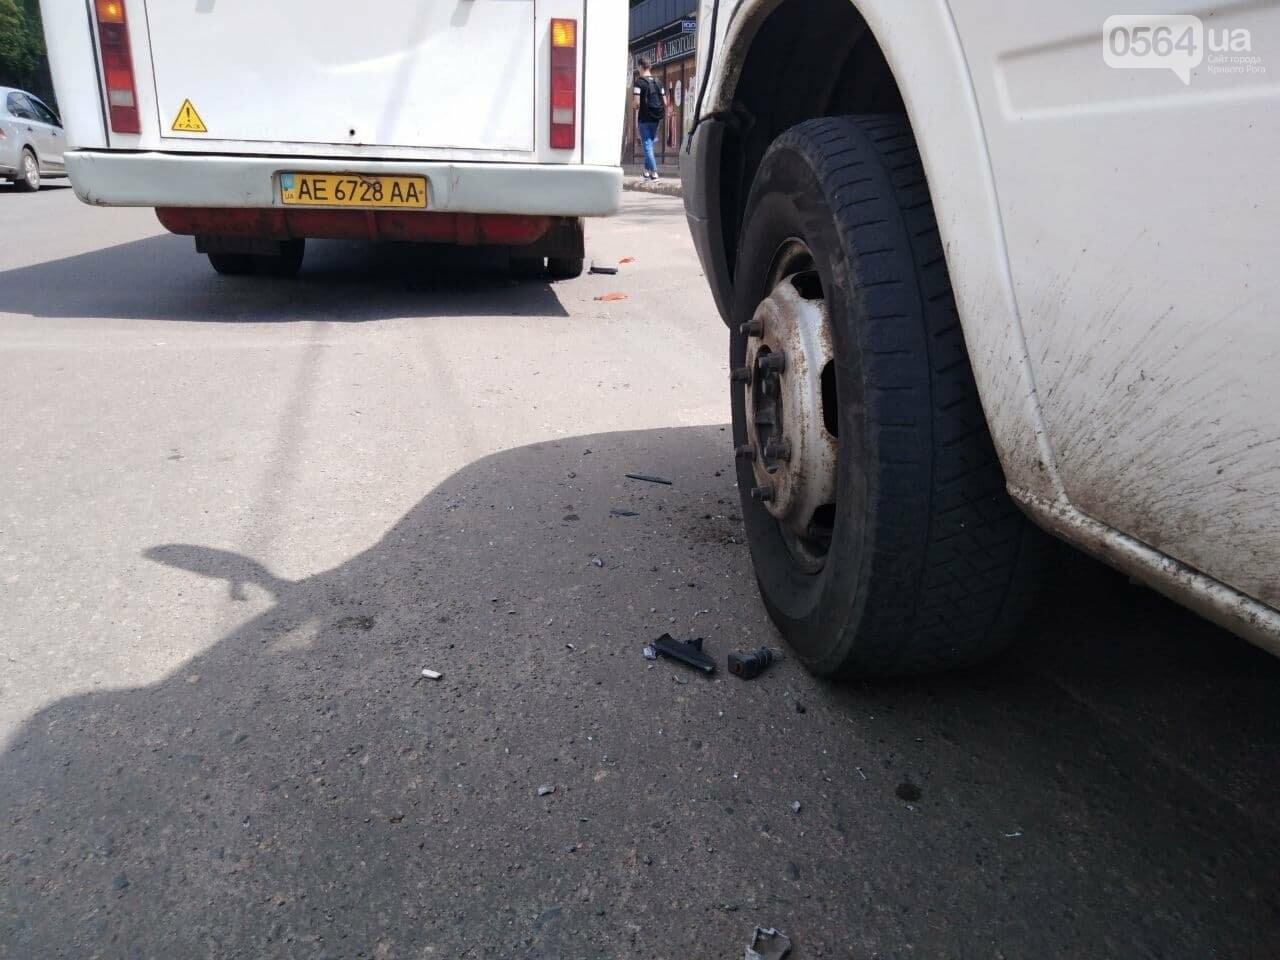 В Кривом Роге столкнулись две маршрутки, - ФОТО, фото-3